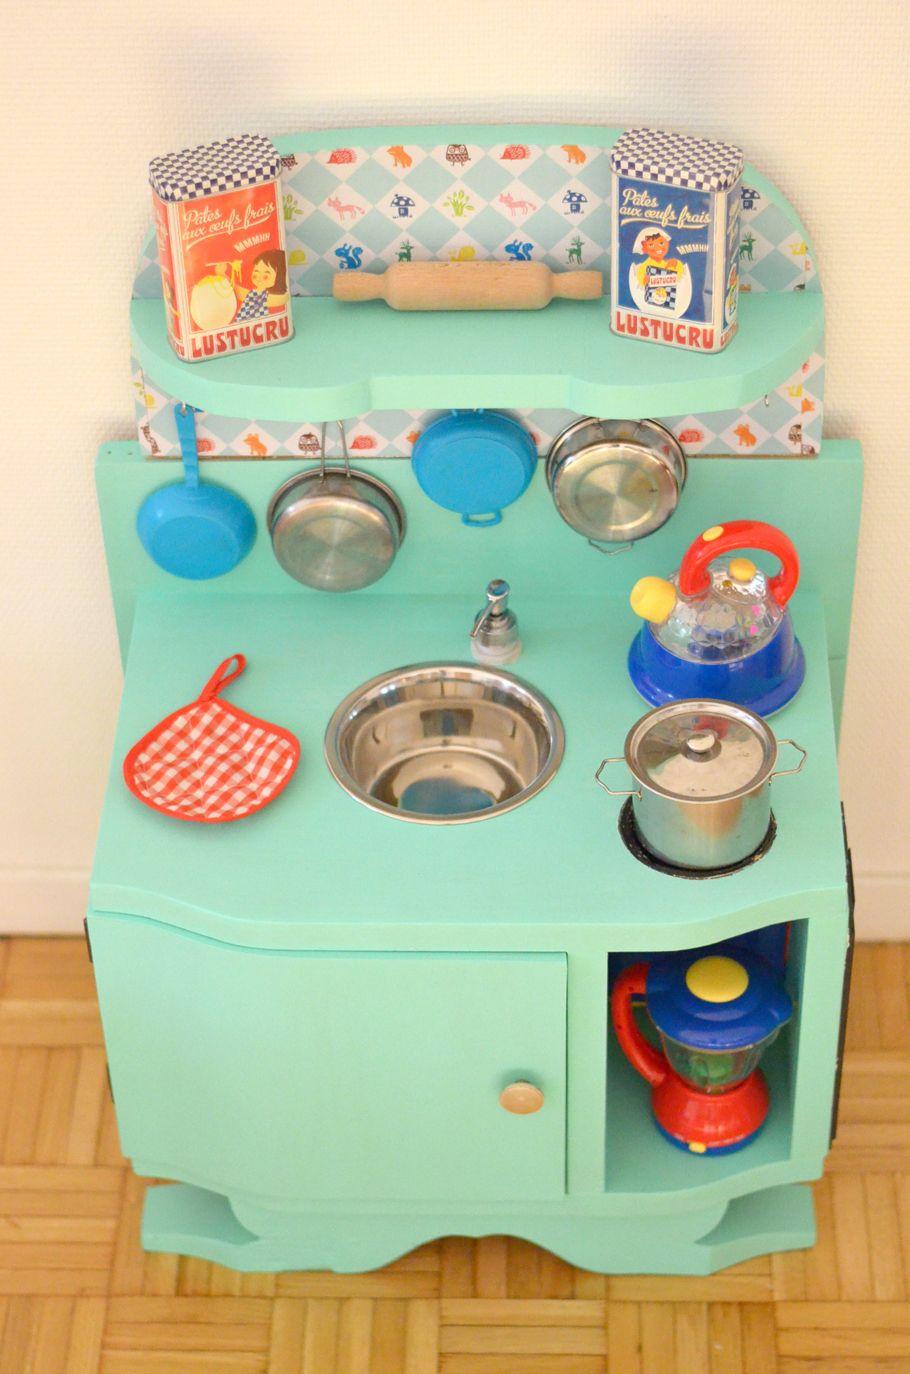 diy r cup 39 upcycling fabriquer une cuisine en bois enfant blog diy pinterest cuisine. Black Bedroom Furniture Sets. Home Design Ideas